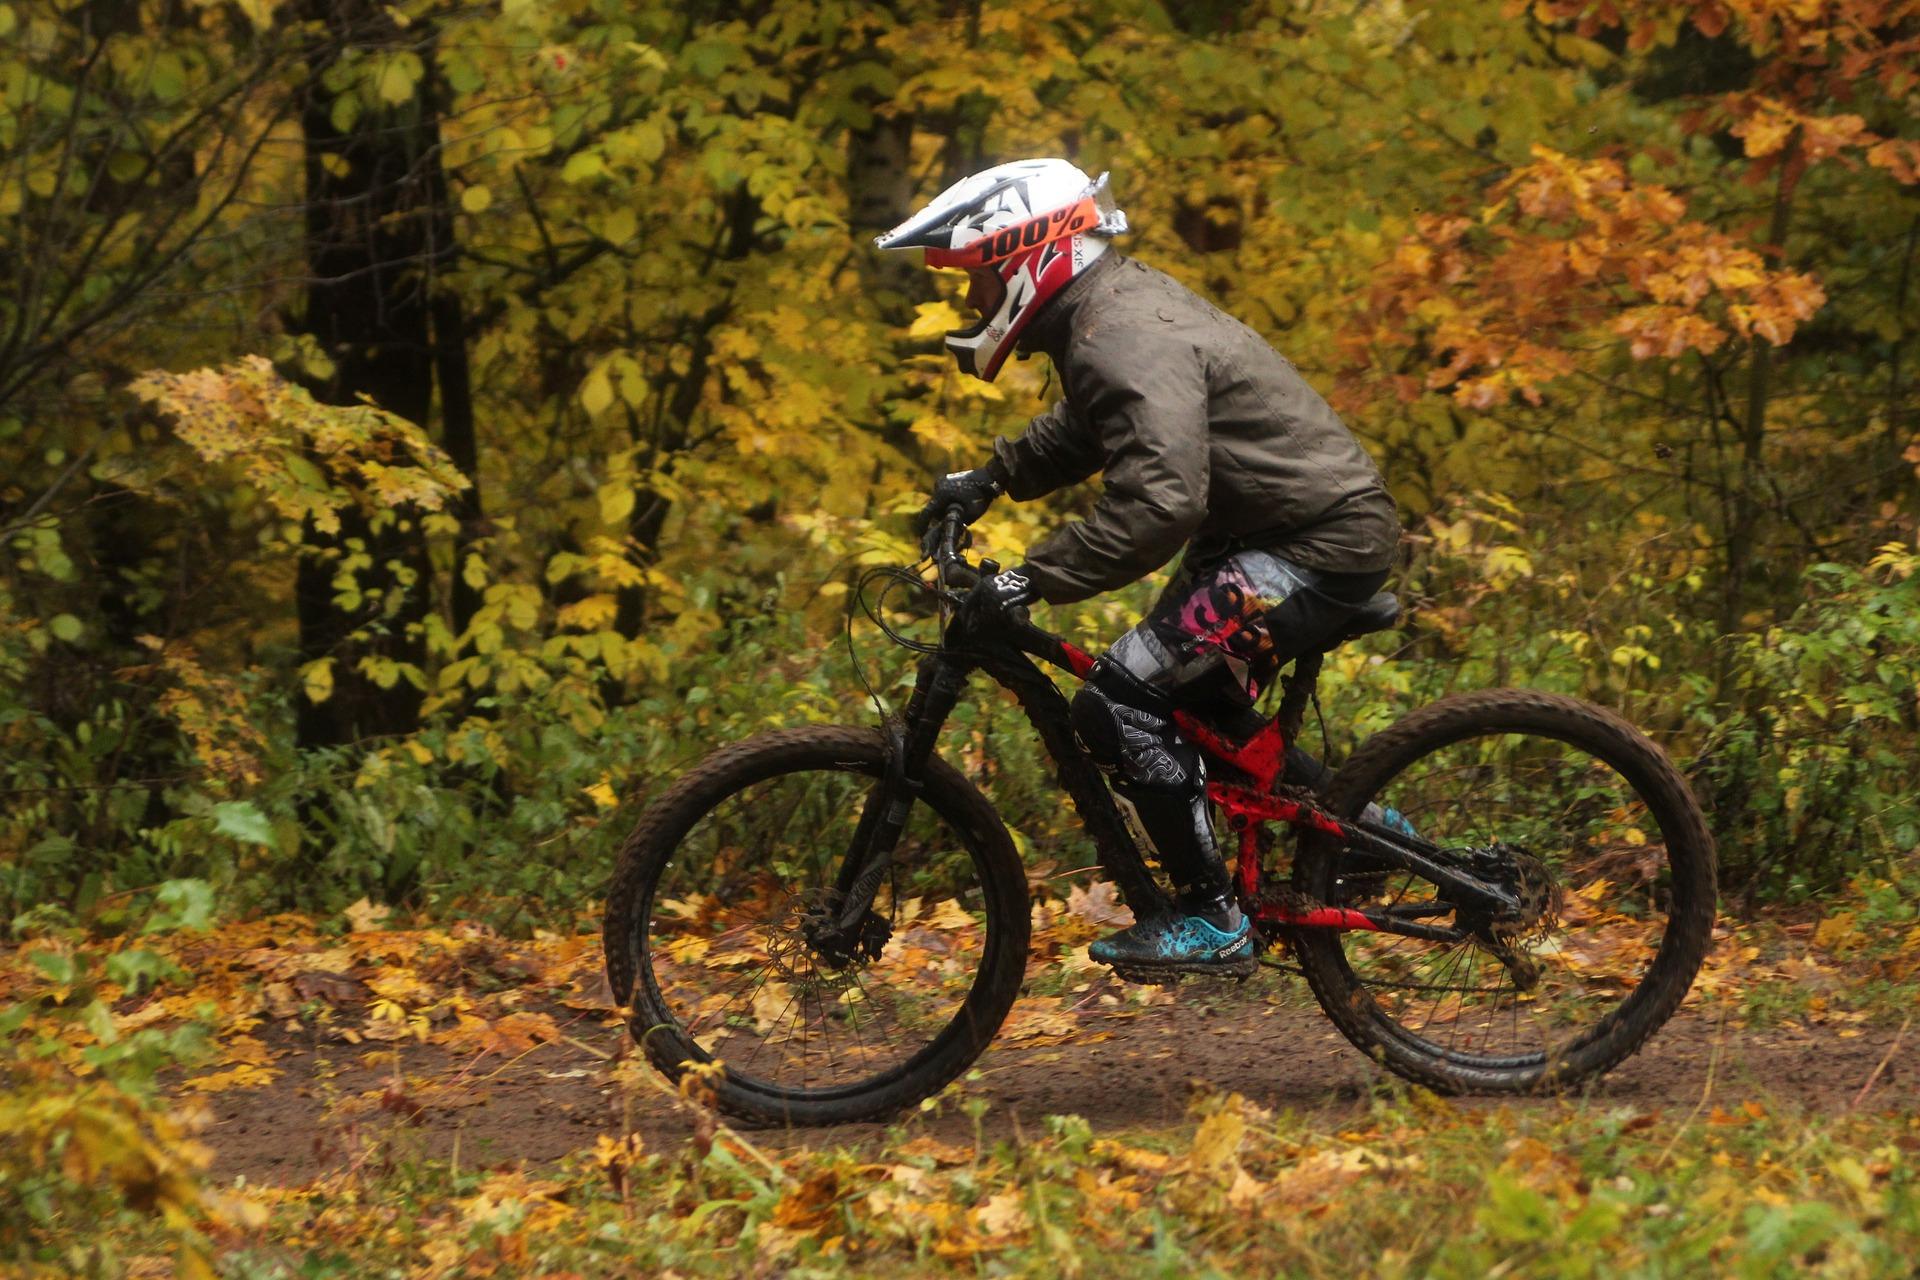 ungdom med cykel